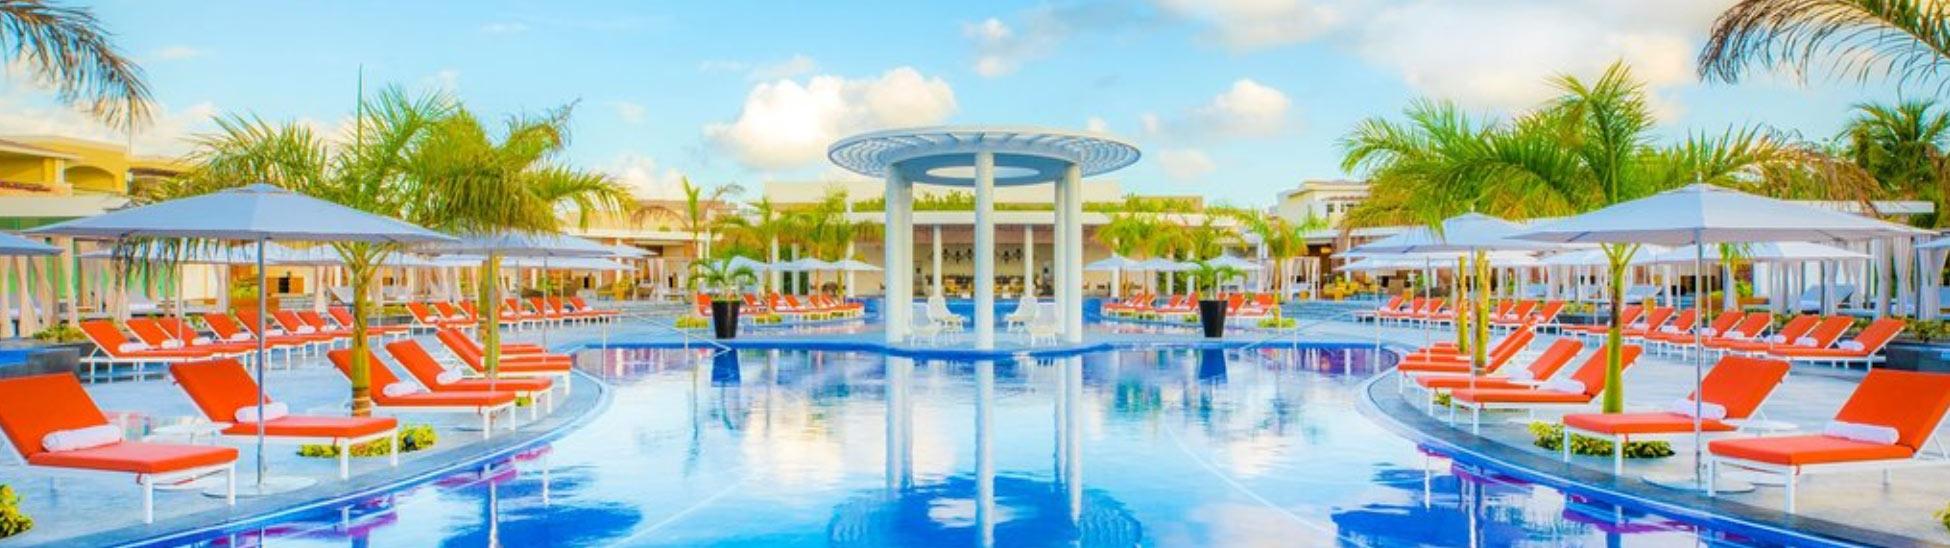 3 Splurge-Worthy All-Inclusive Palace Resorts in Cancun